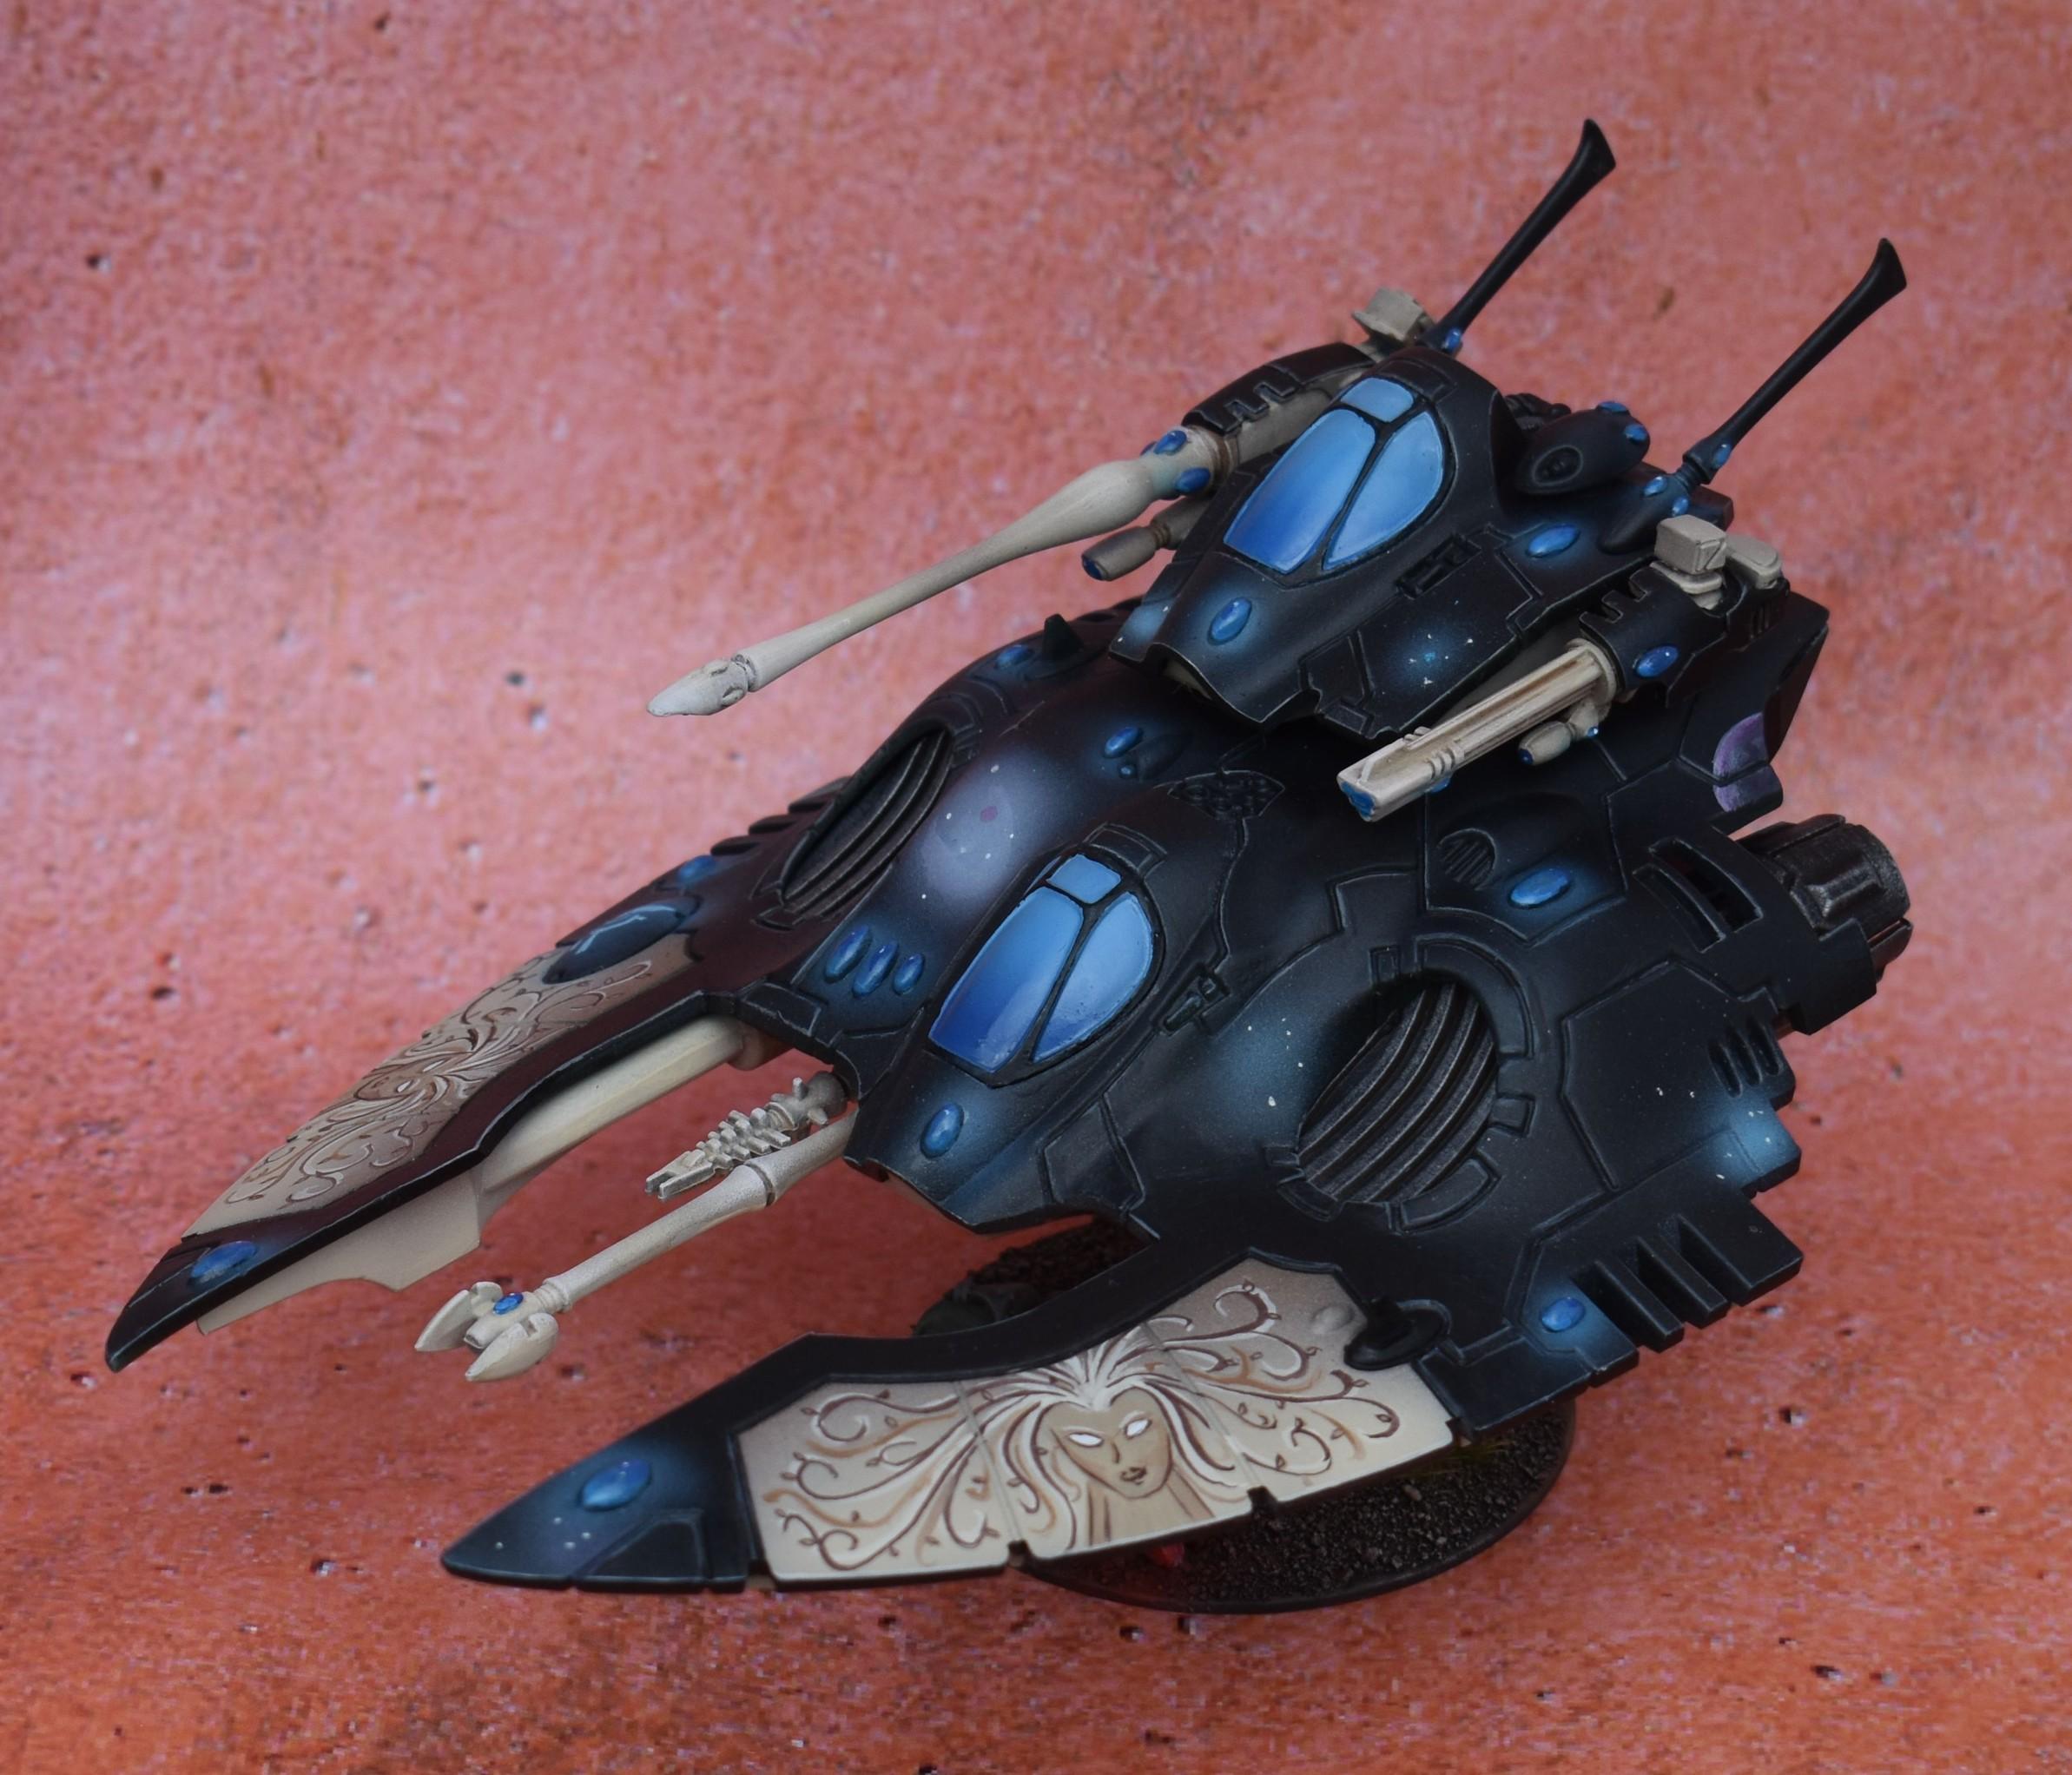 Dark Eldar, Eldar, Falcon, Fleet, Freehand, Isha, Object Source Lighting, Raider, Serpent, Tank, Ulthwe, Venom, Ynnari